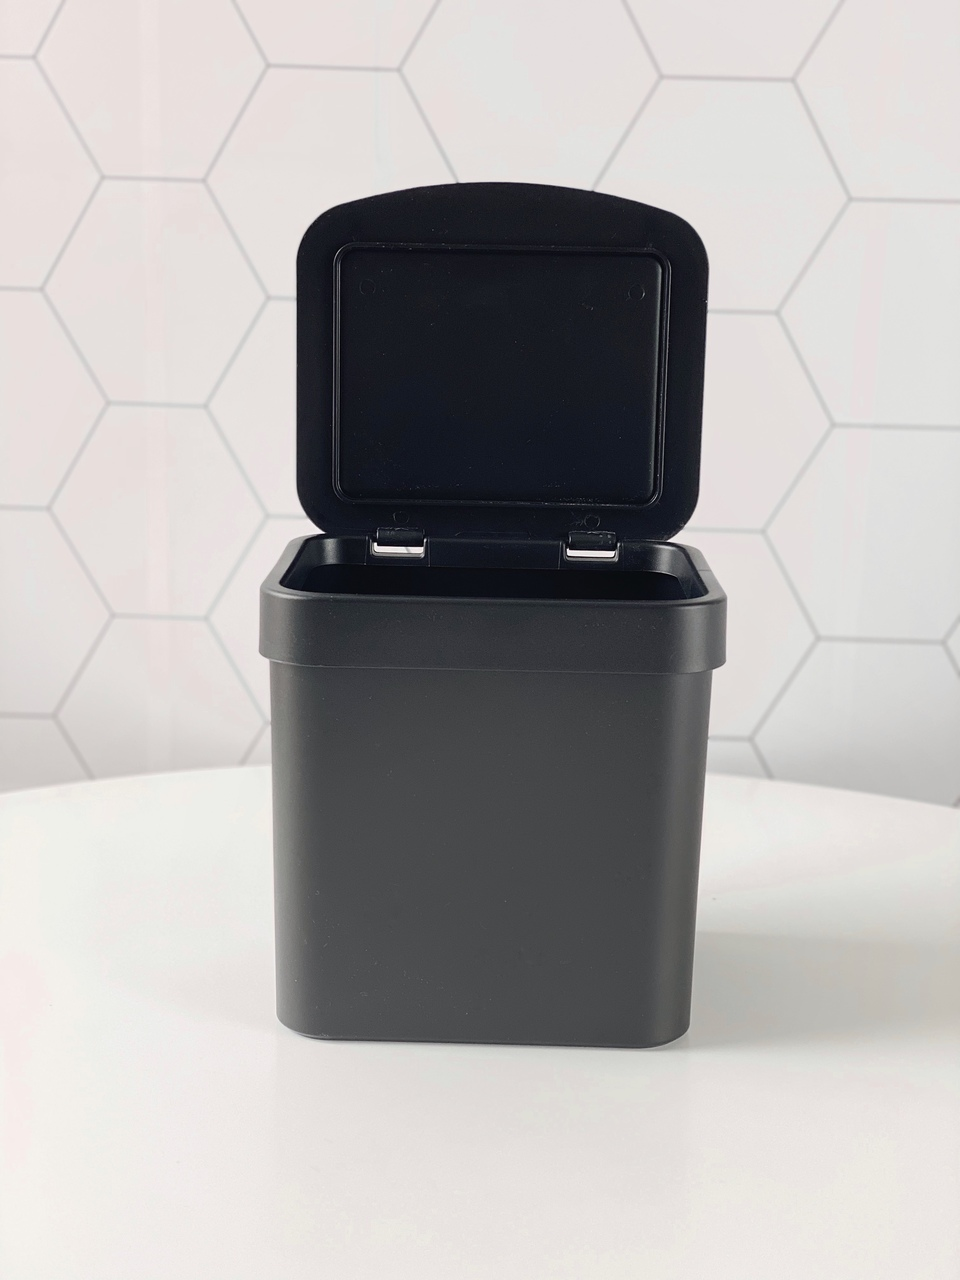 Lixeira Para Pia De Cozinha - 4,7 Litros  - CASACOBRE